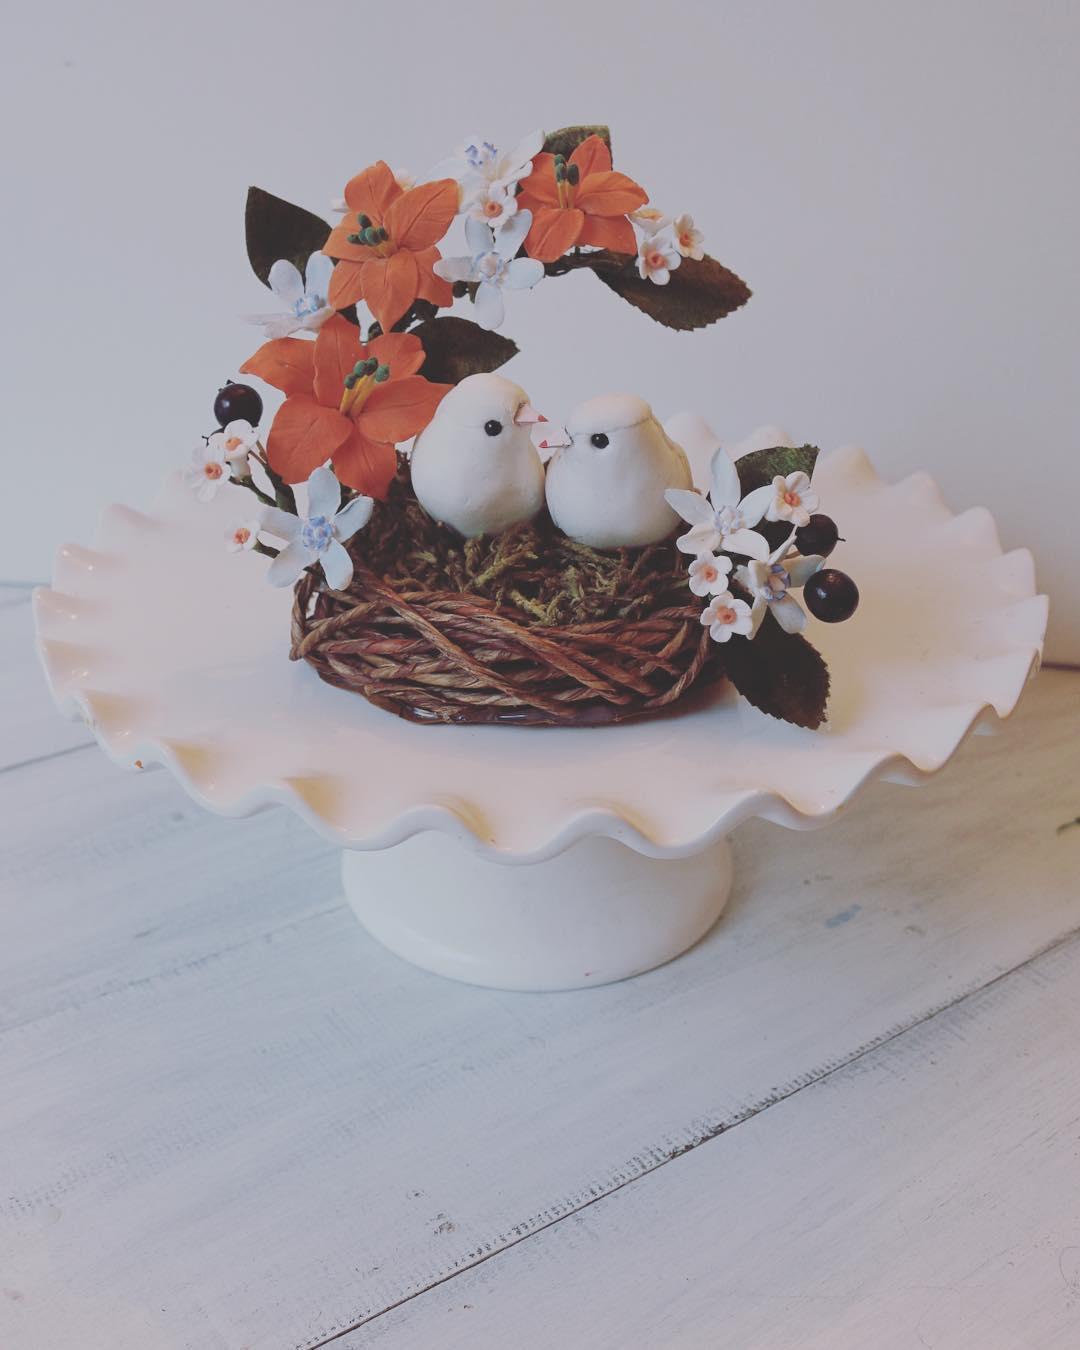 Handmade Forget me nots wedding cake topper bird nest in blue ...